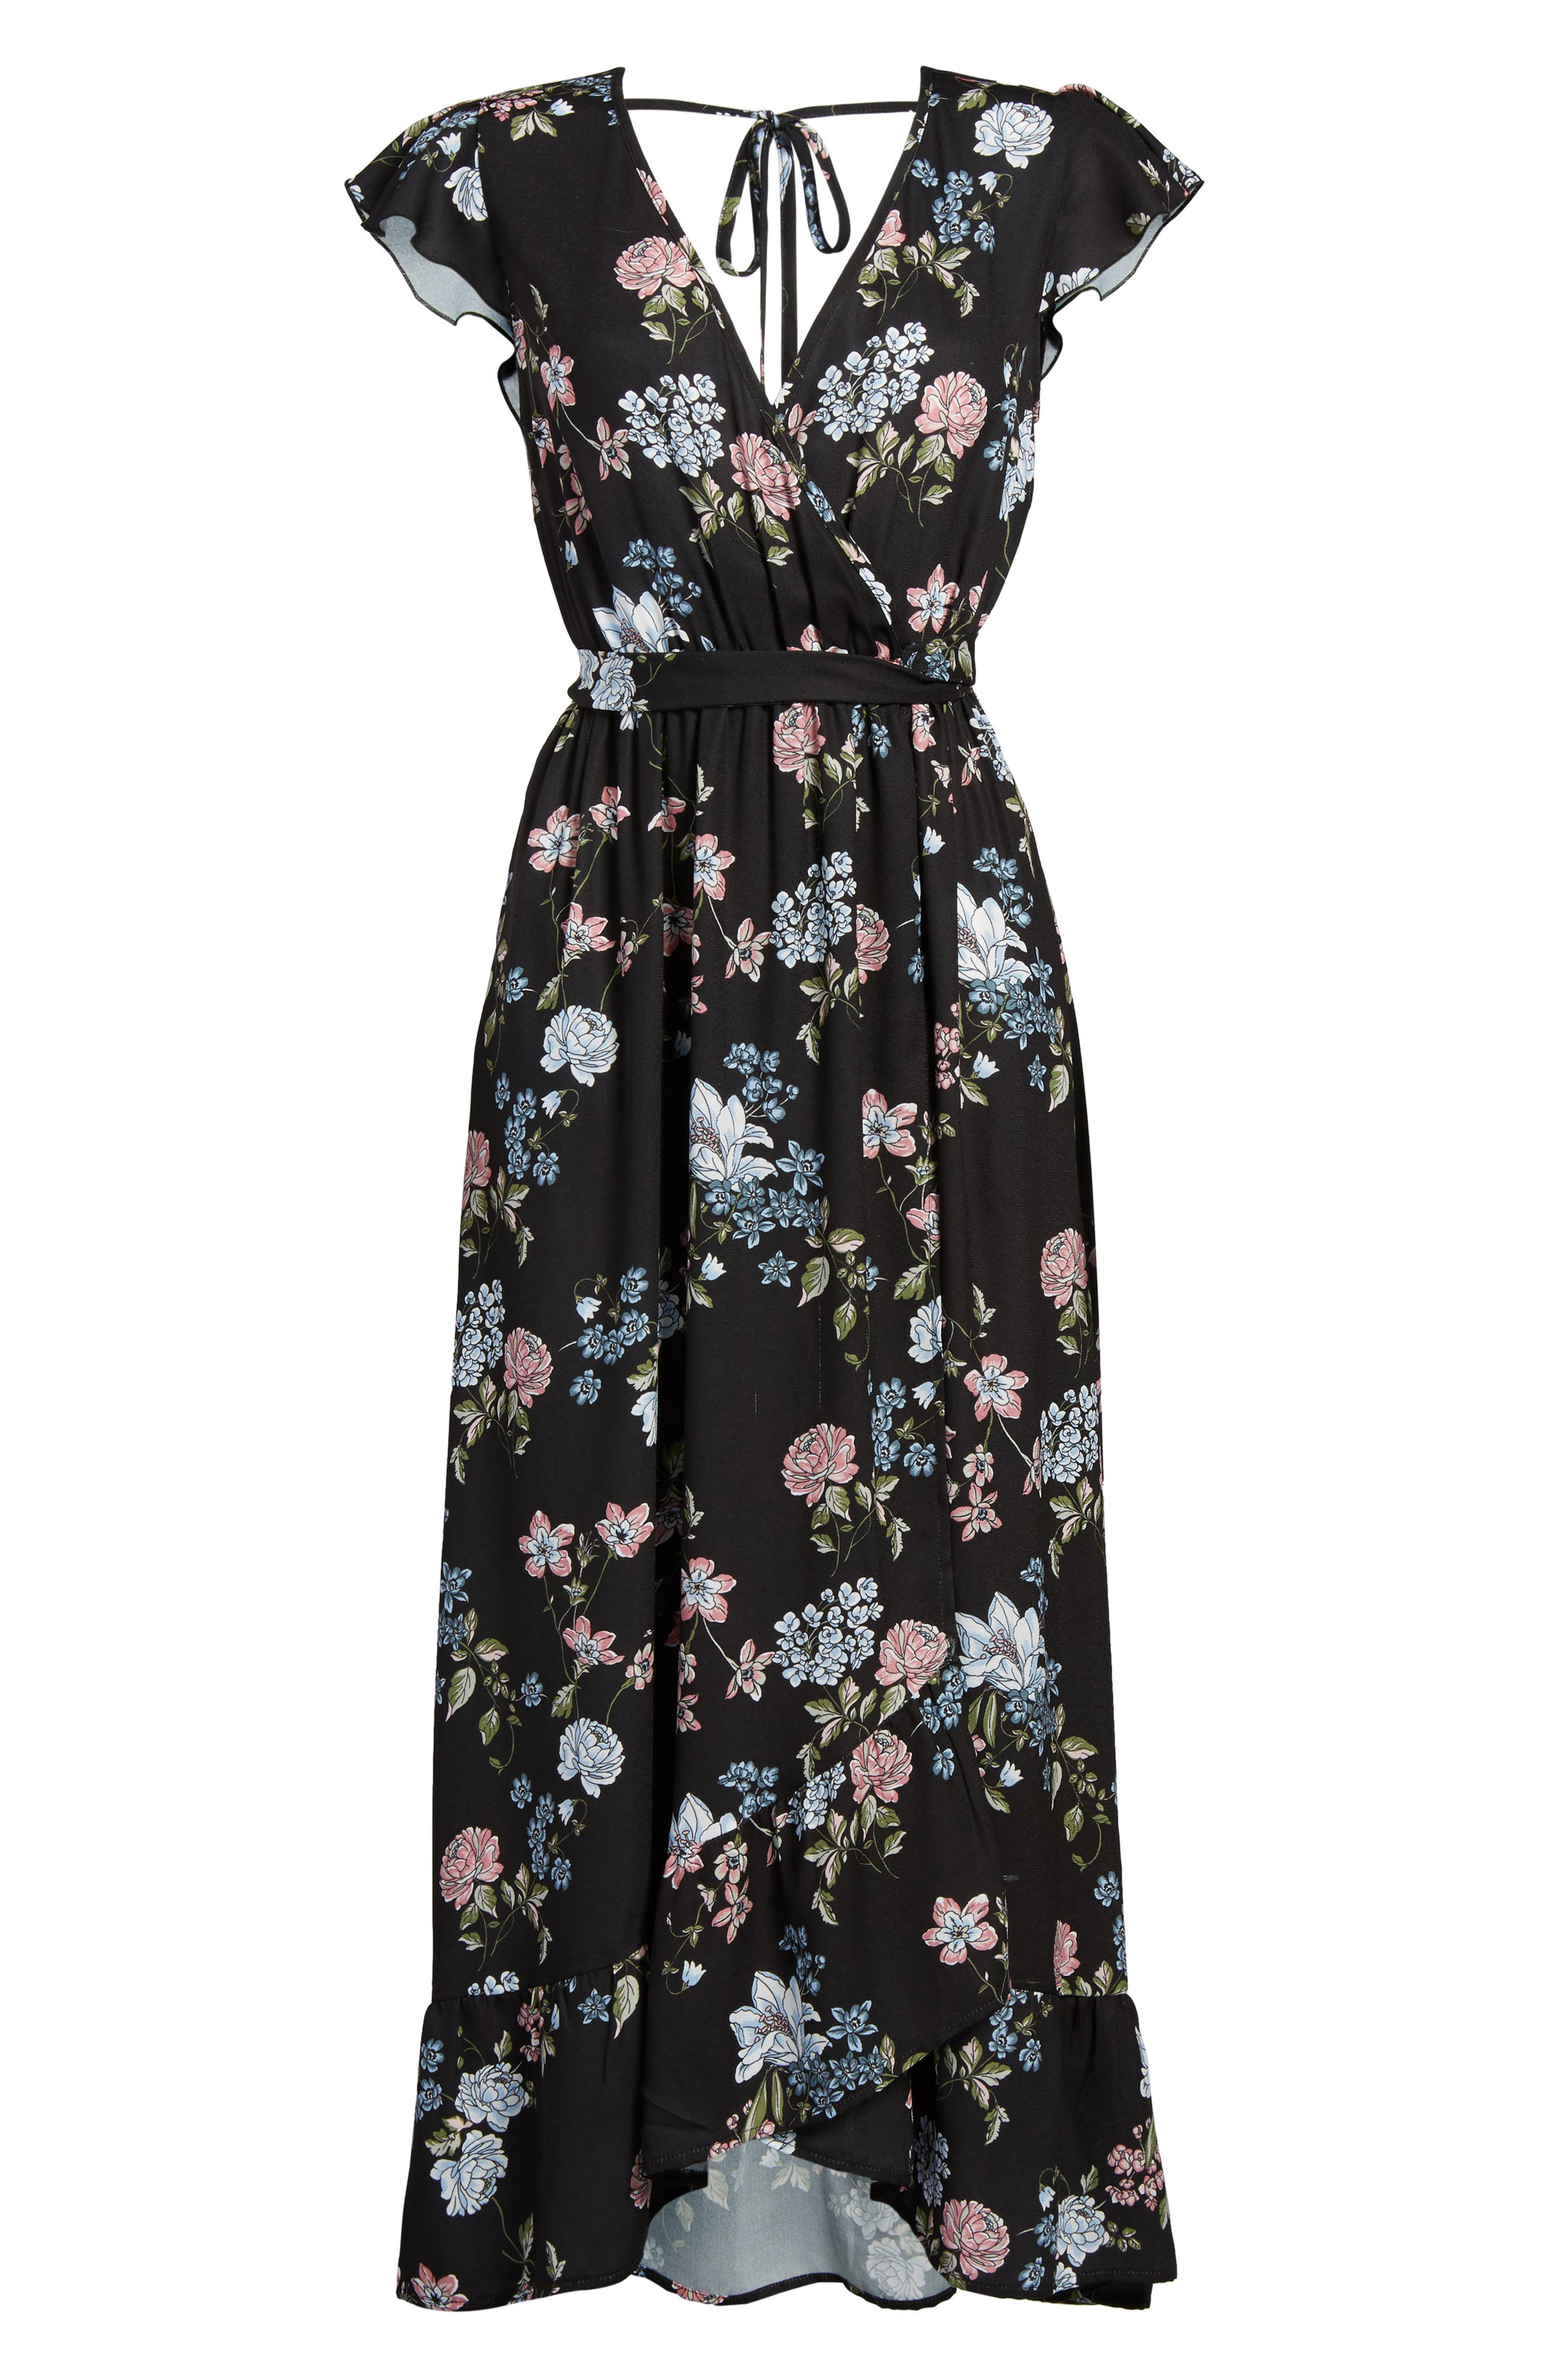 BAND OF GYPSIES, Faux Wrap Maxi Dress, Alternate thumbnail 6, color, 004